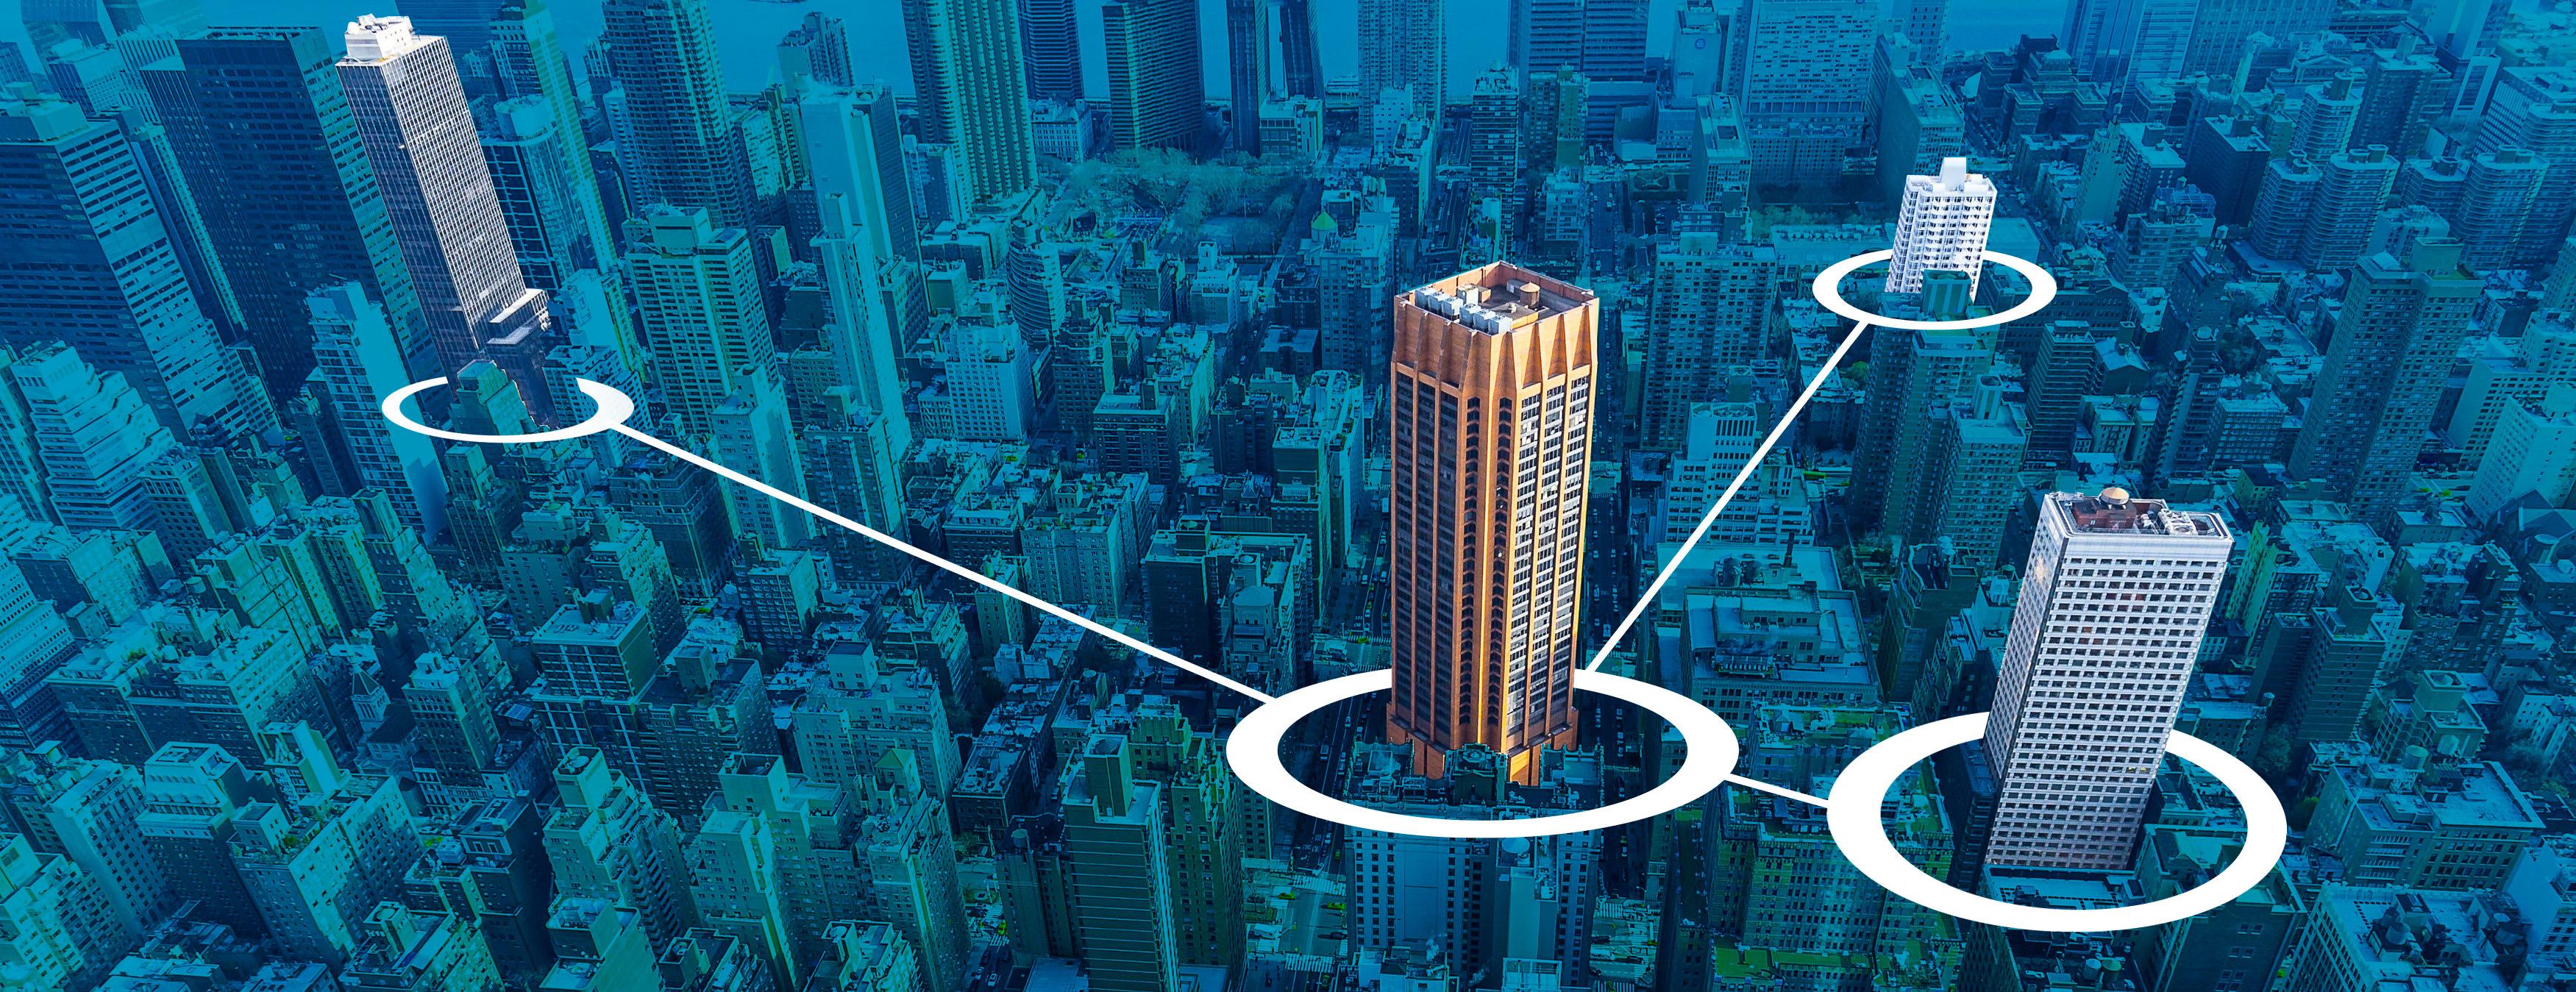 Five companies using the hub-and-spoke model